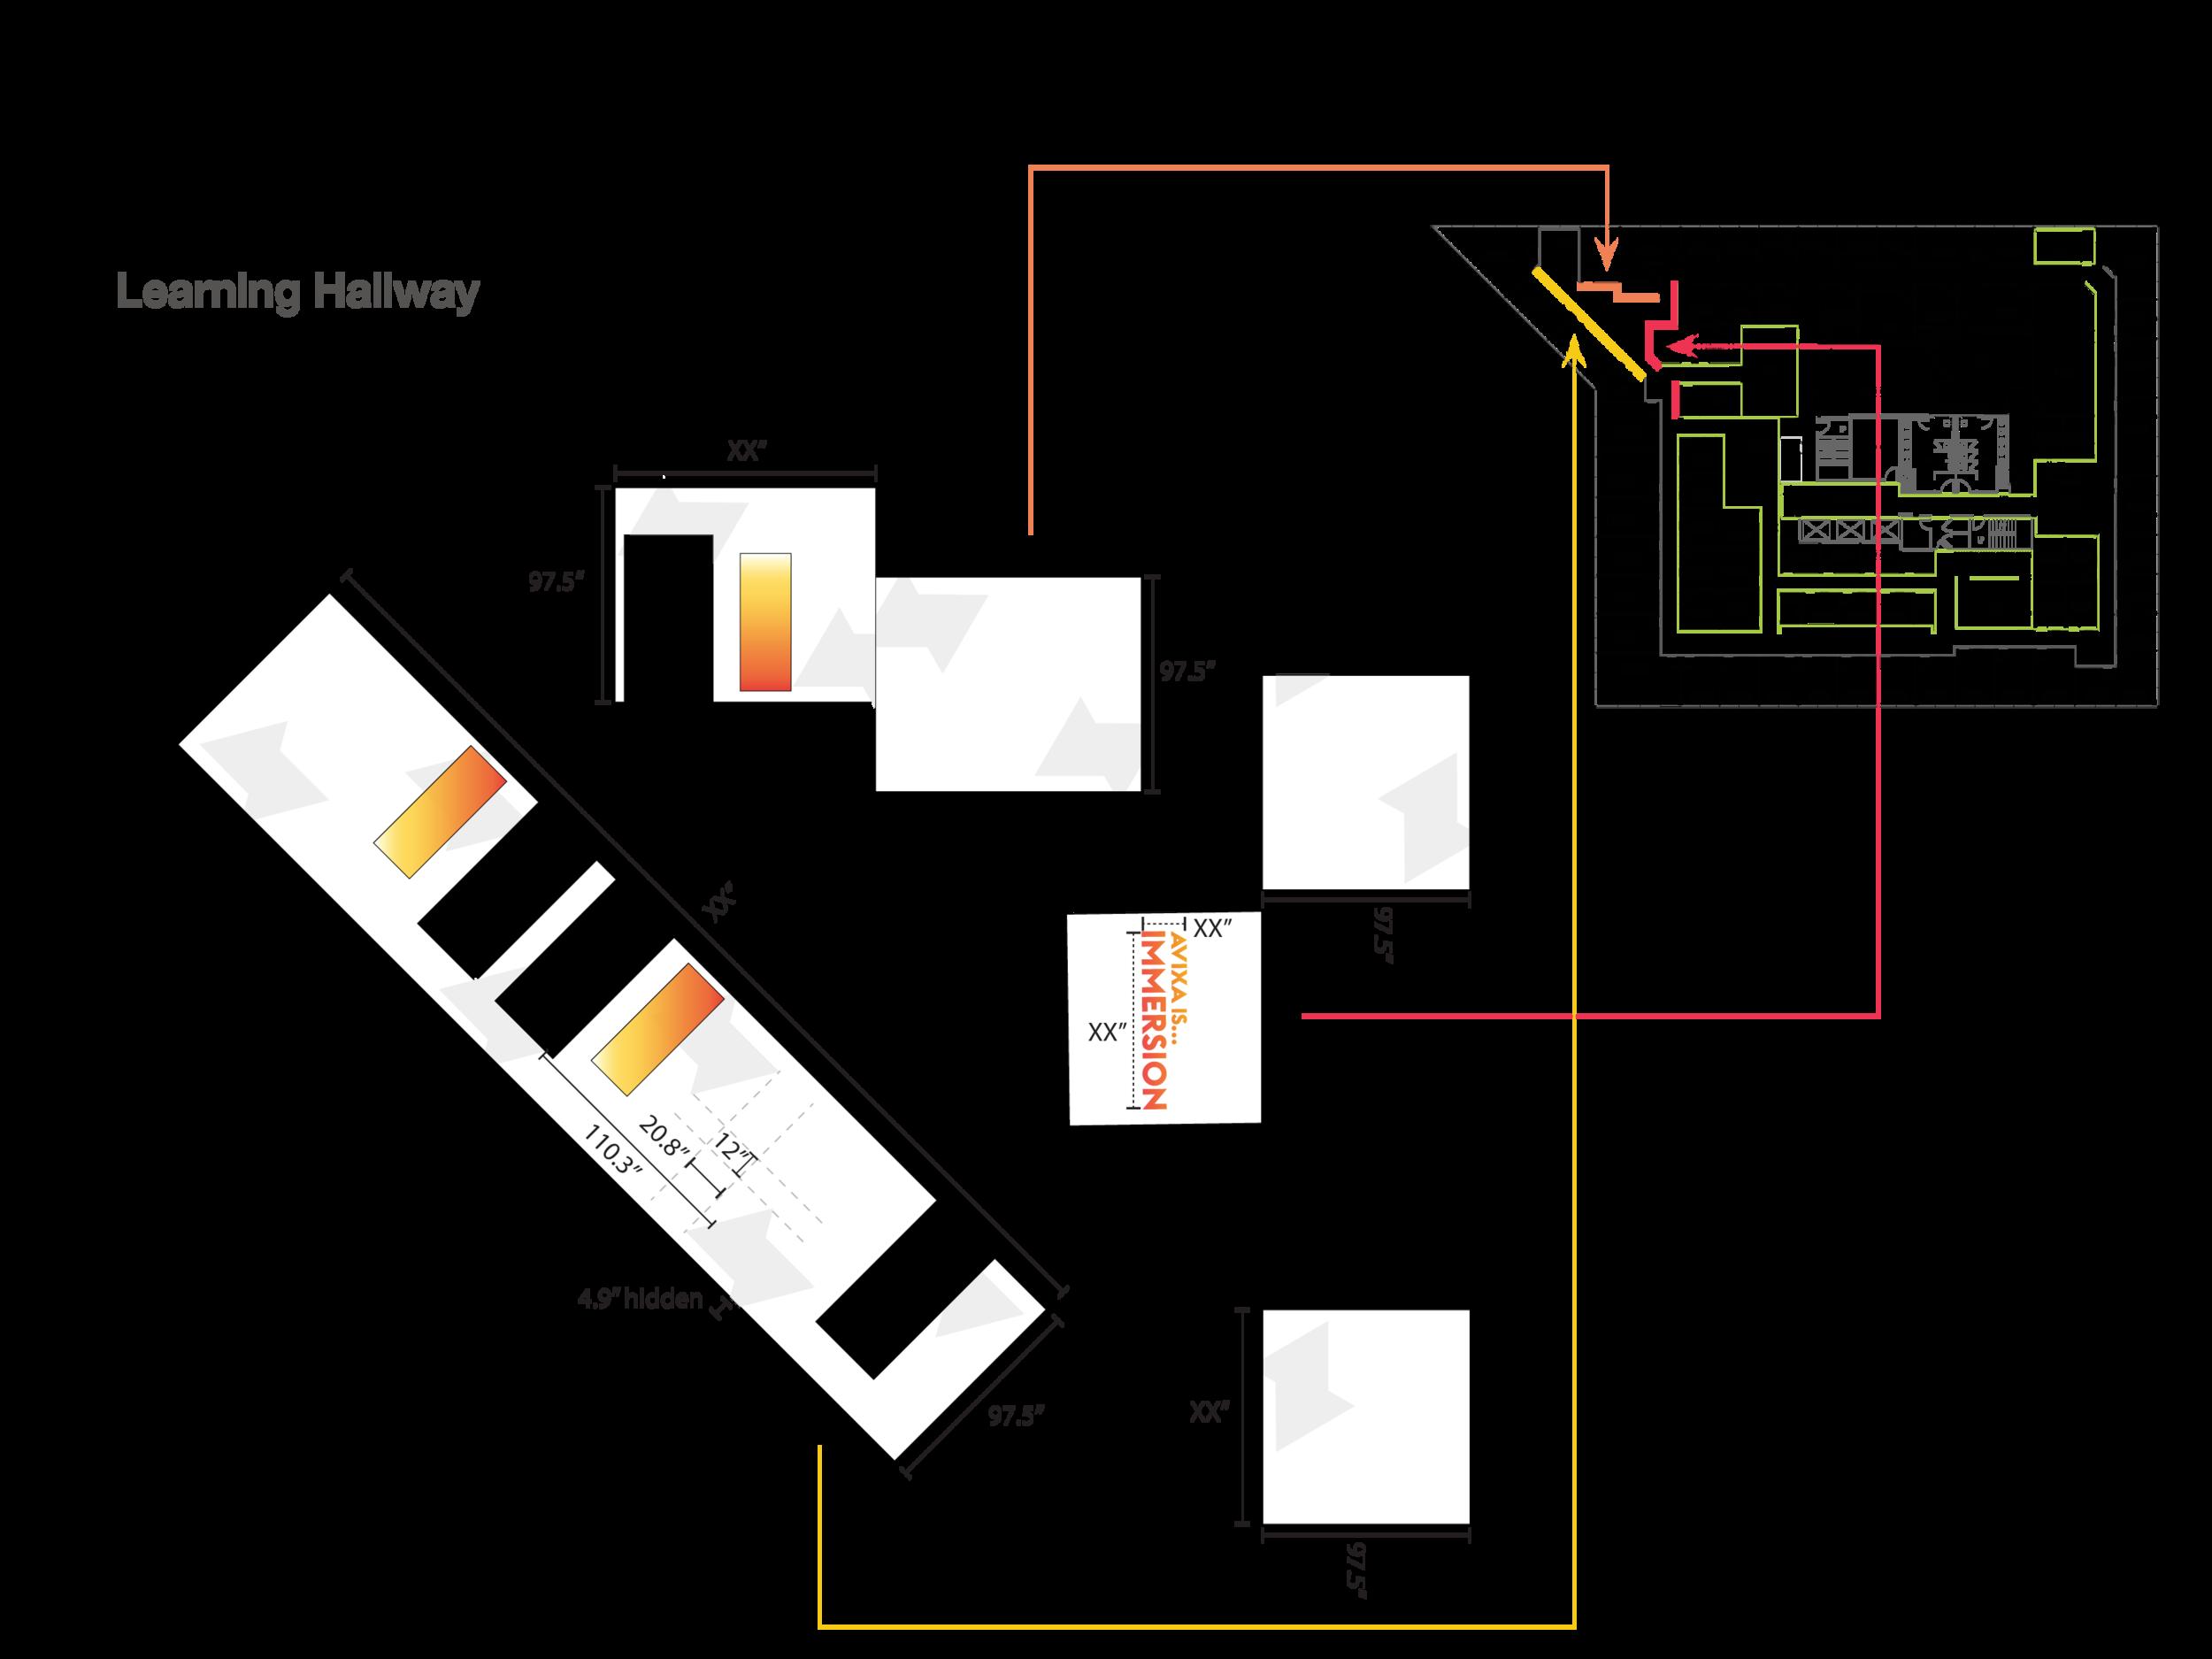 avixa-enviro-elevation-learning_hallway.png